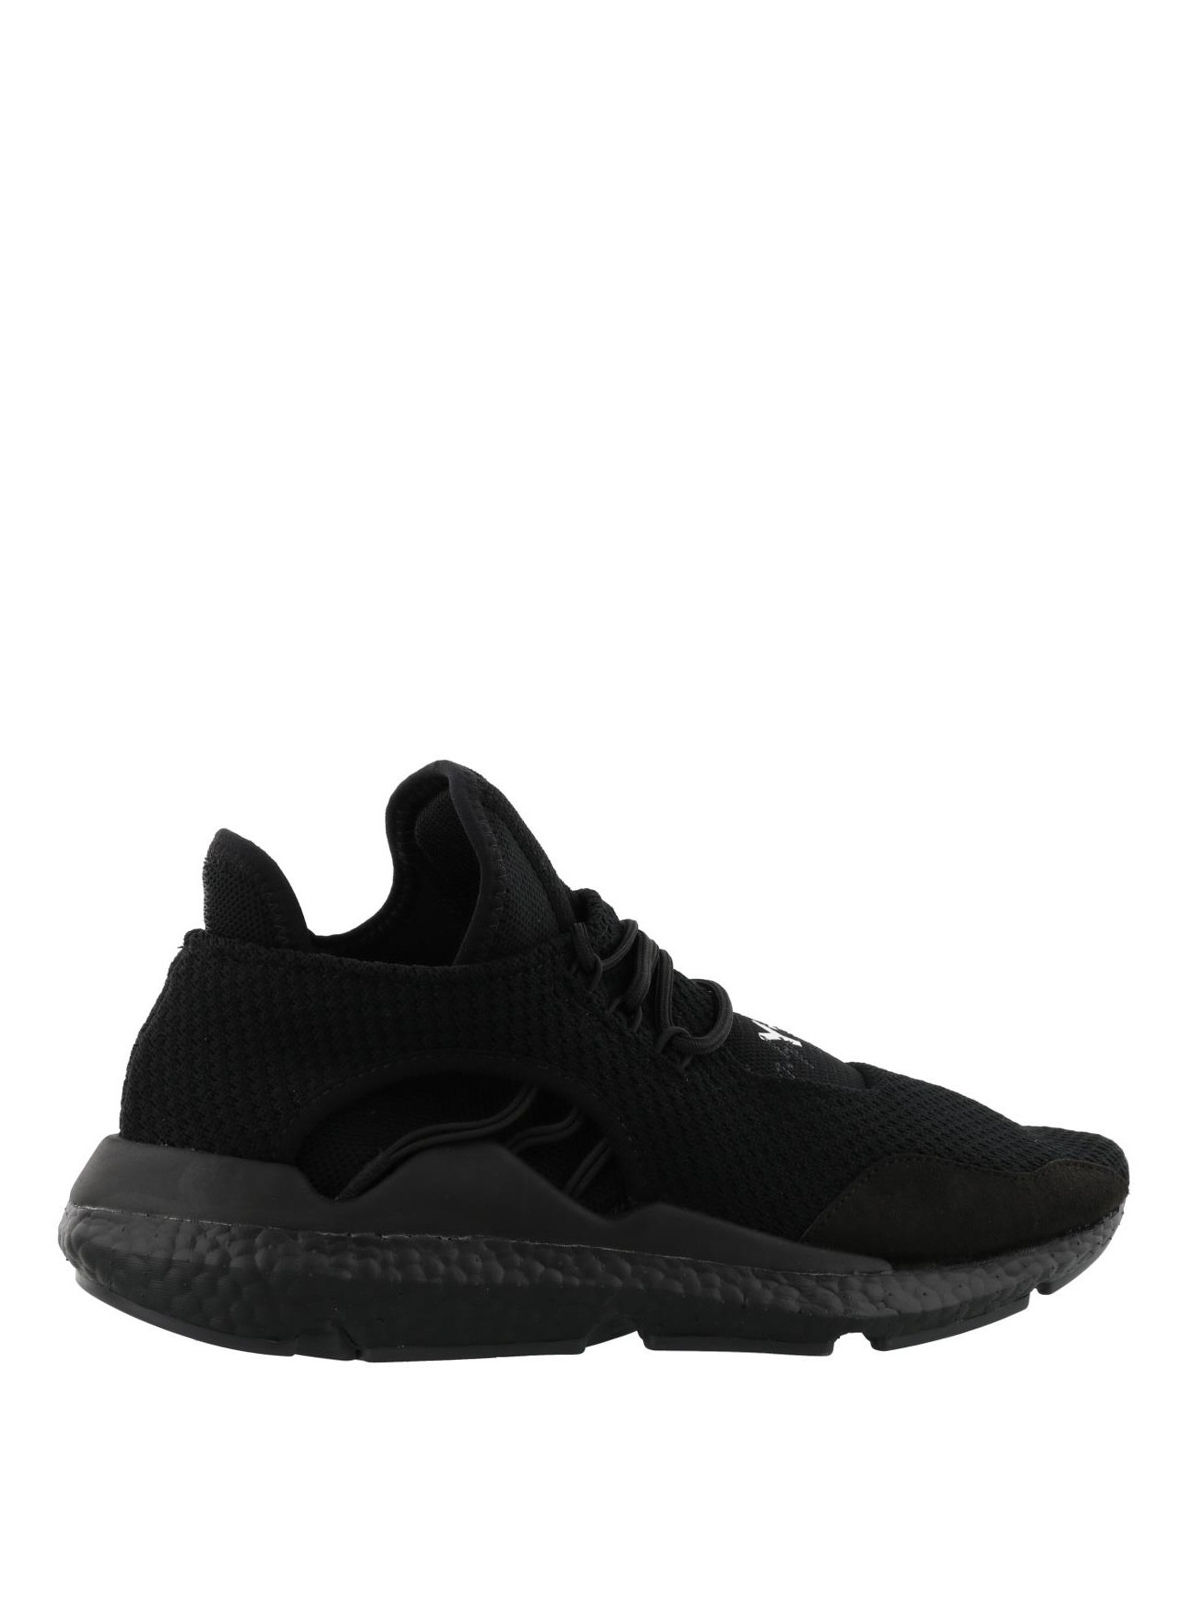 Adidas Y 3 Baskets Saikou Chaussures de sport BC0950